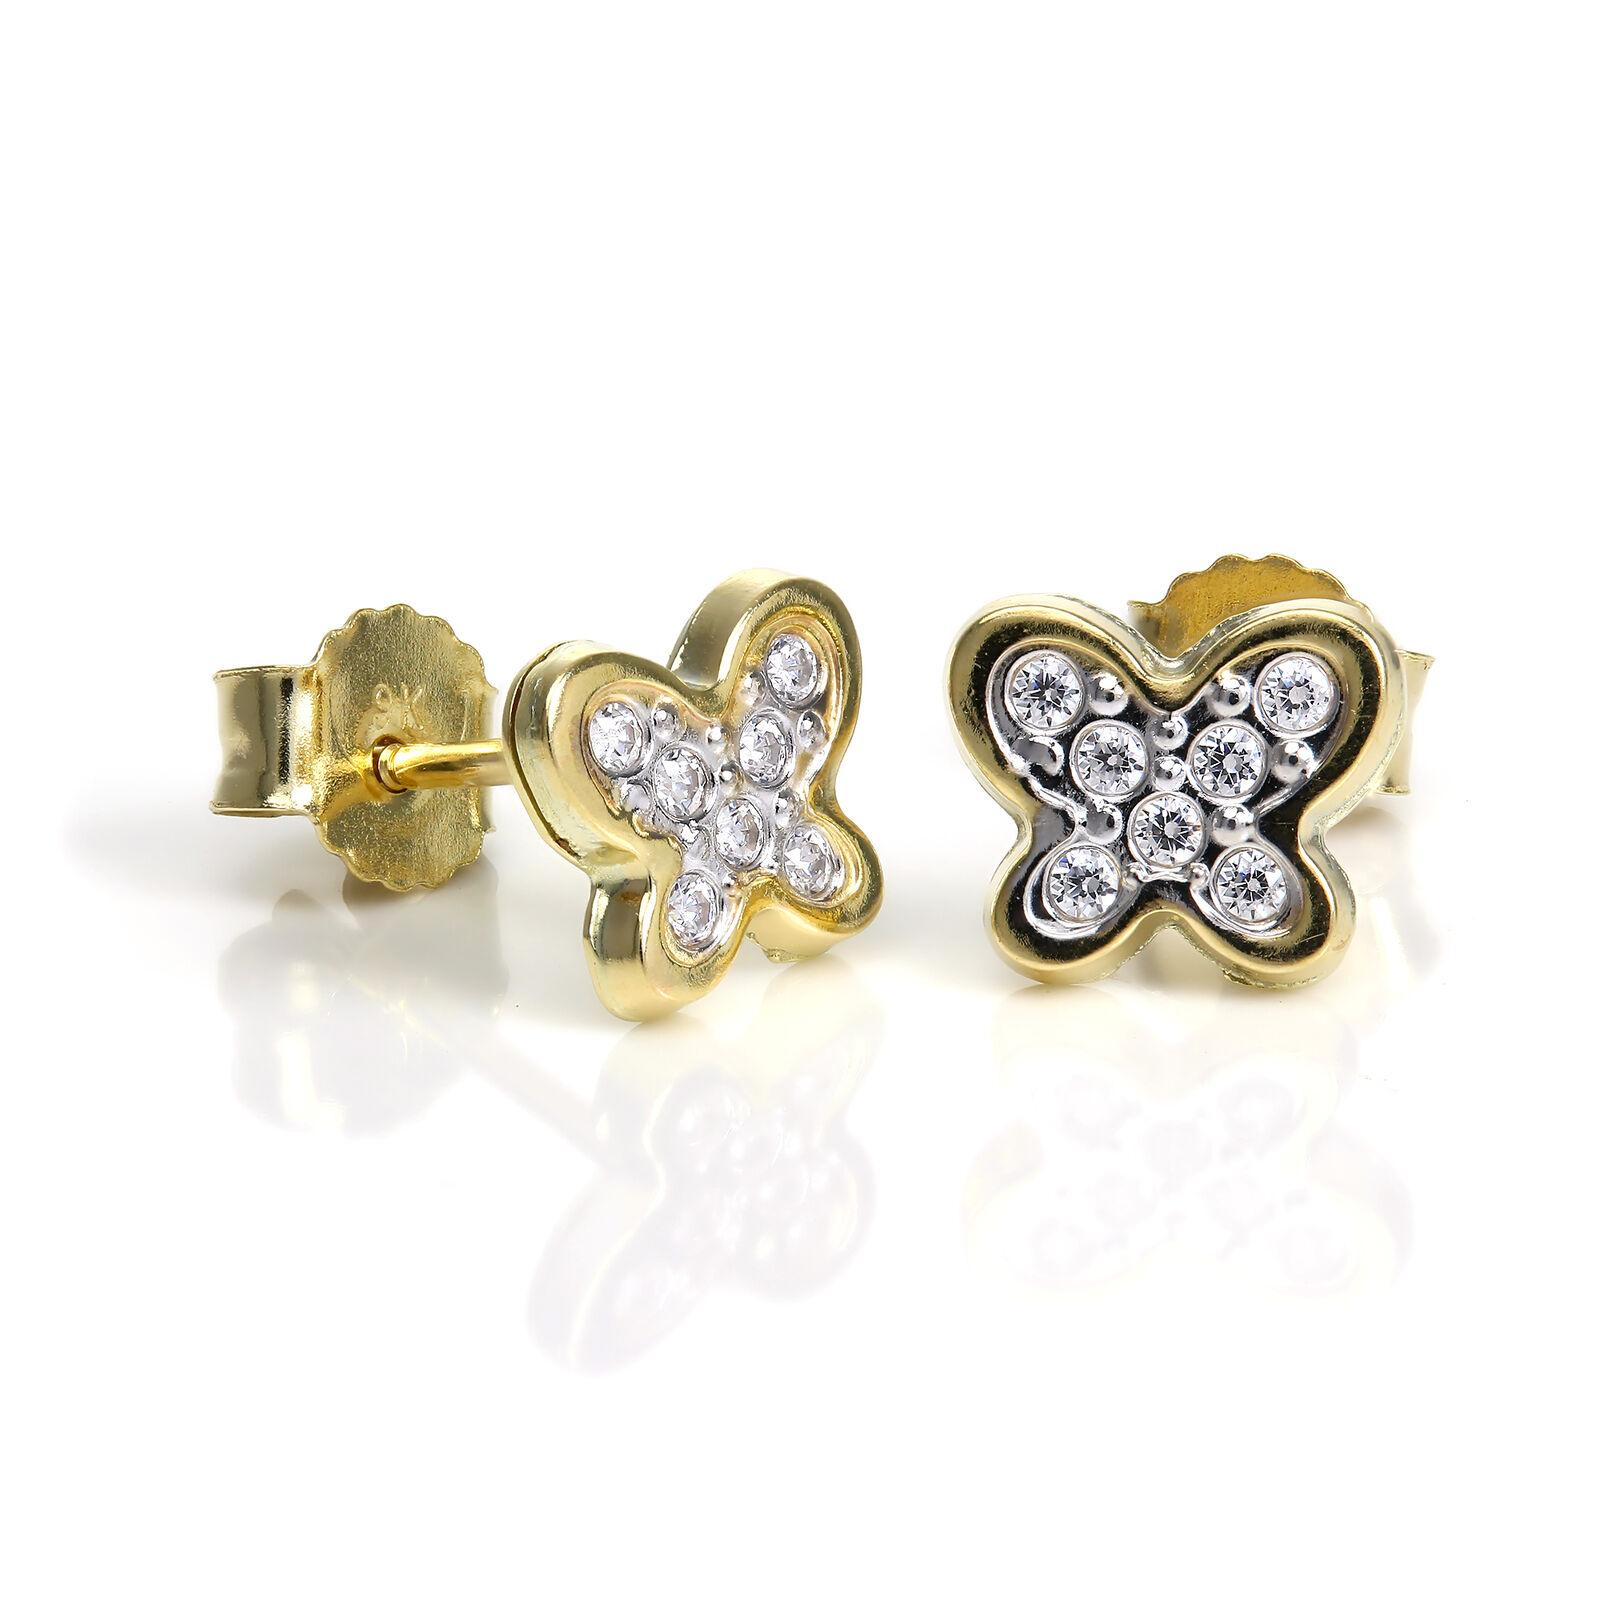 9ct gold & Clear CZ Crystal Encrusted Butterfly Stud Earrings Studs Butterflies